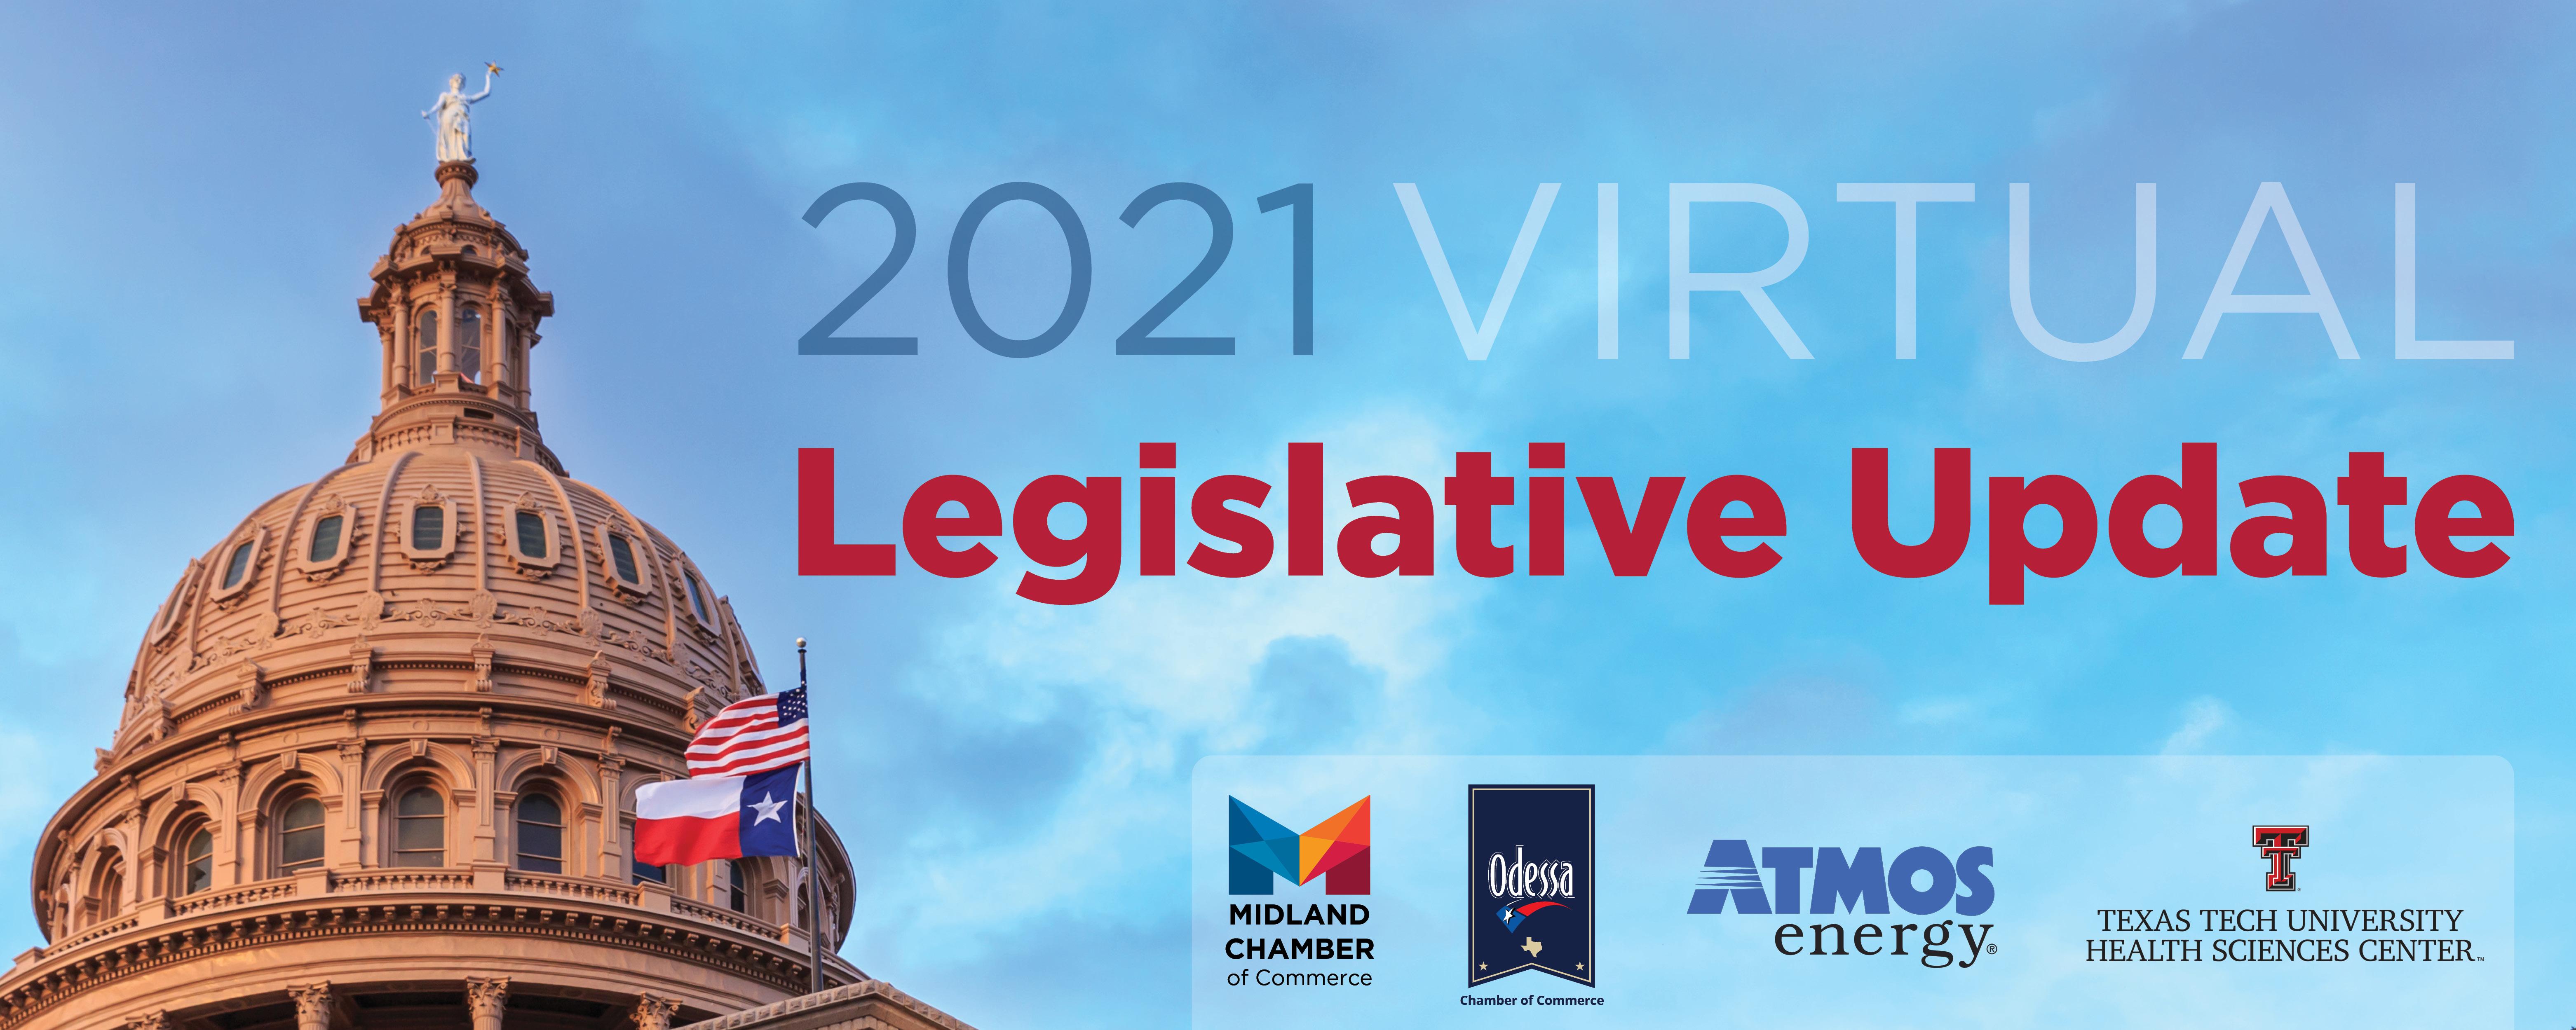 2021 Midland Odessa Legislative Update